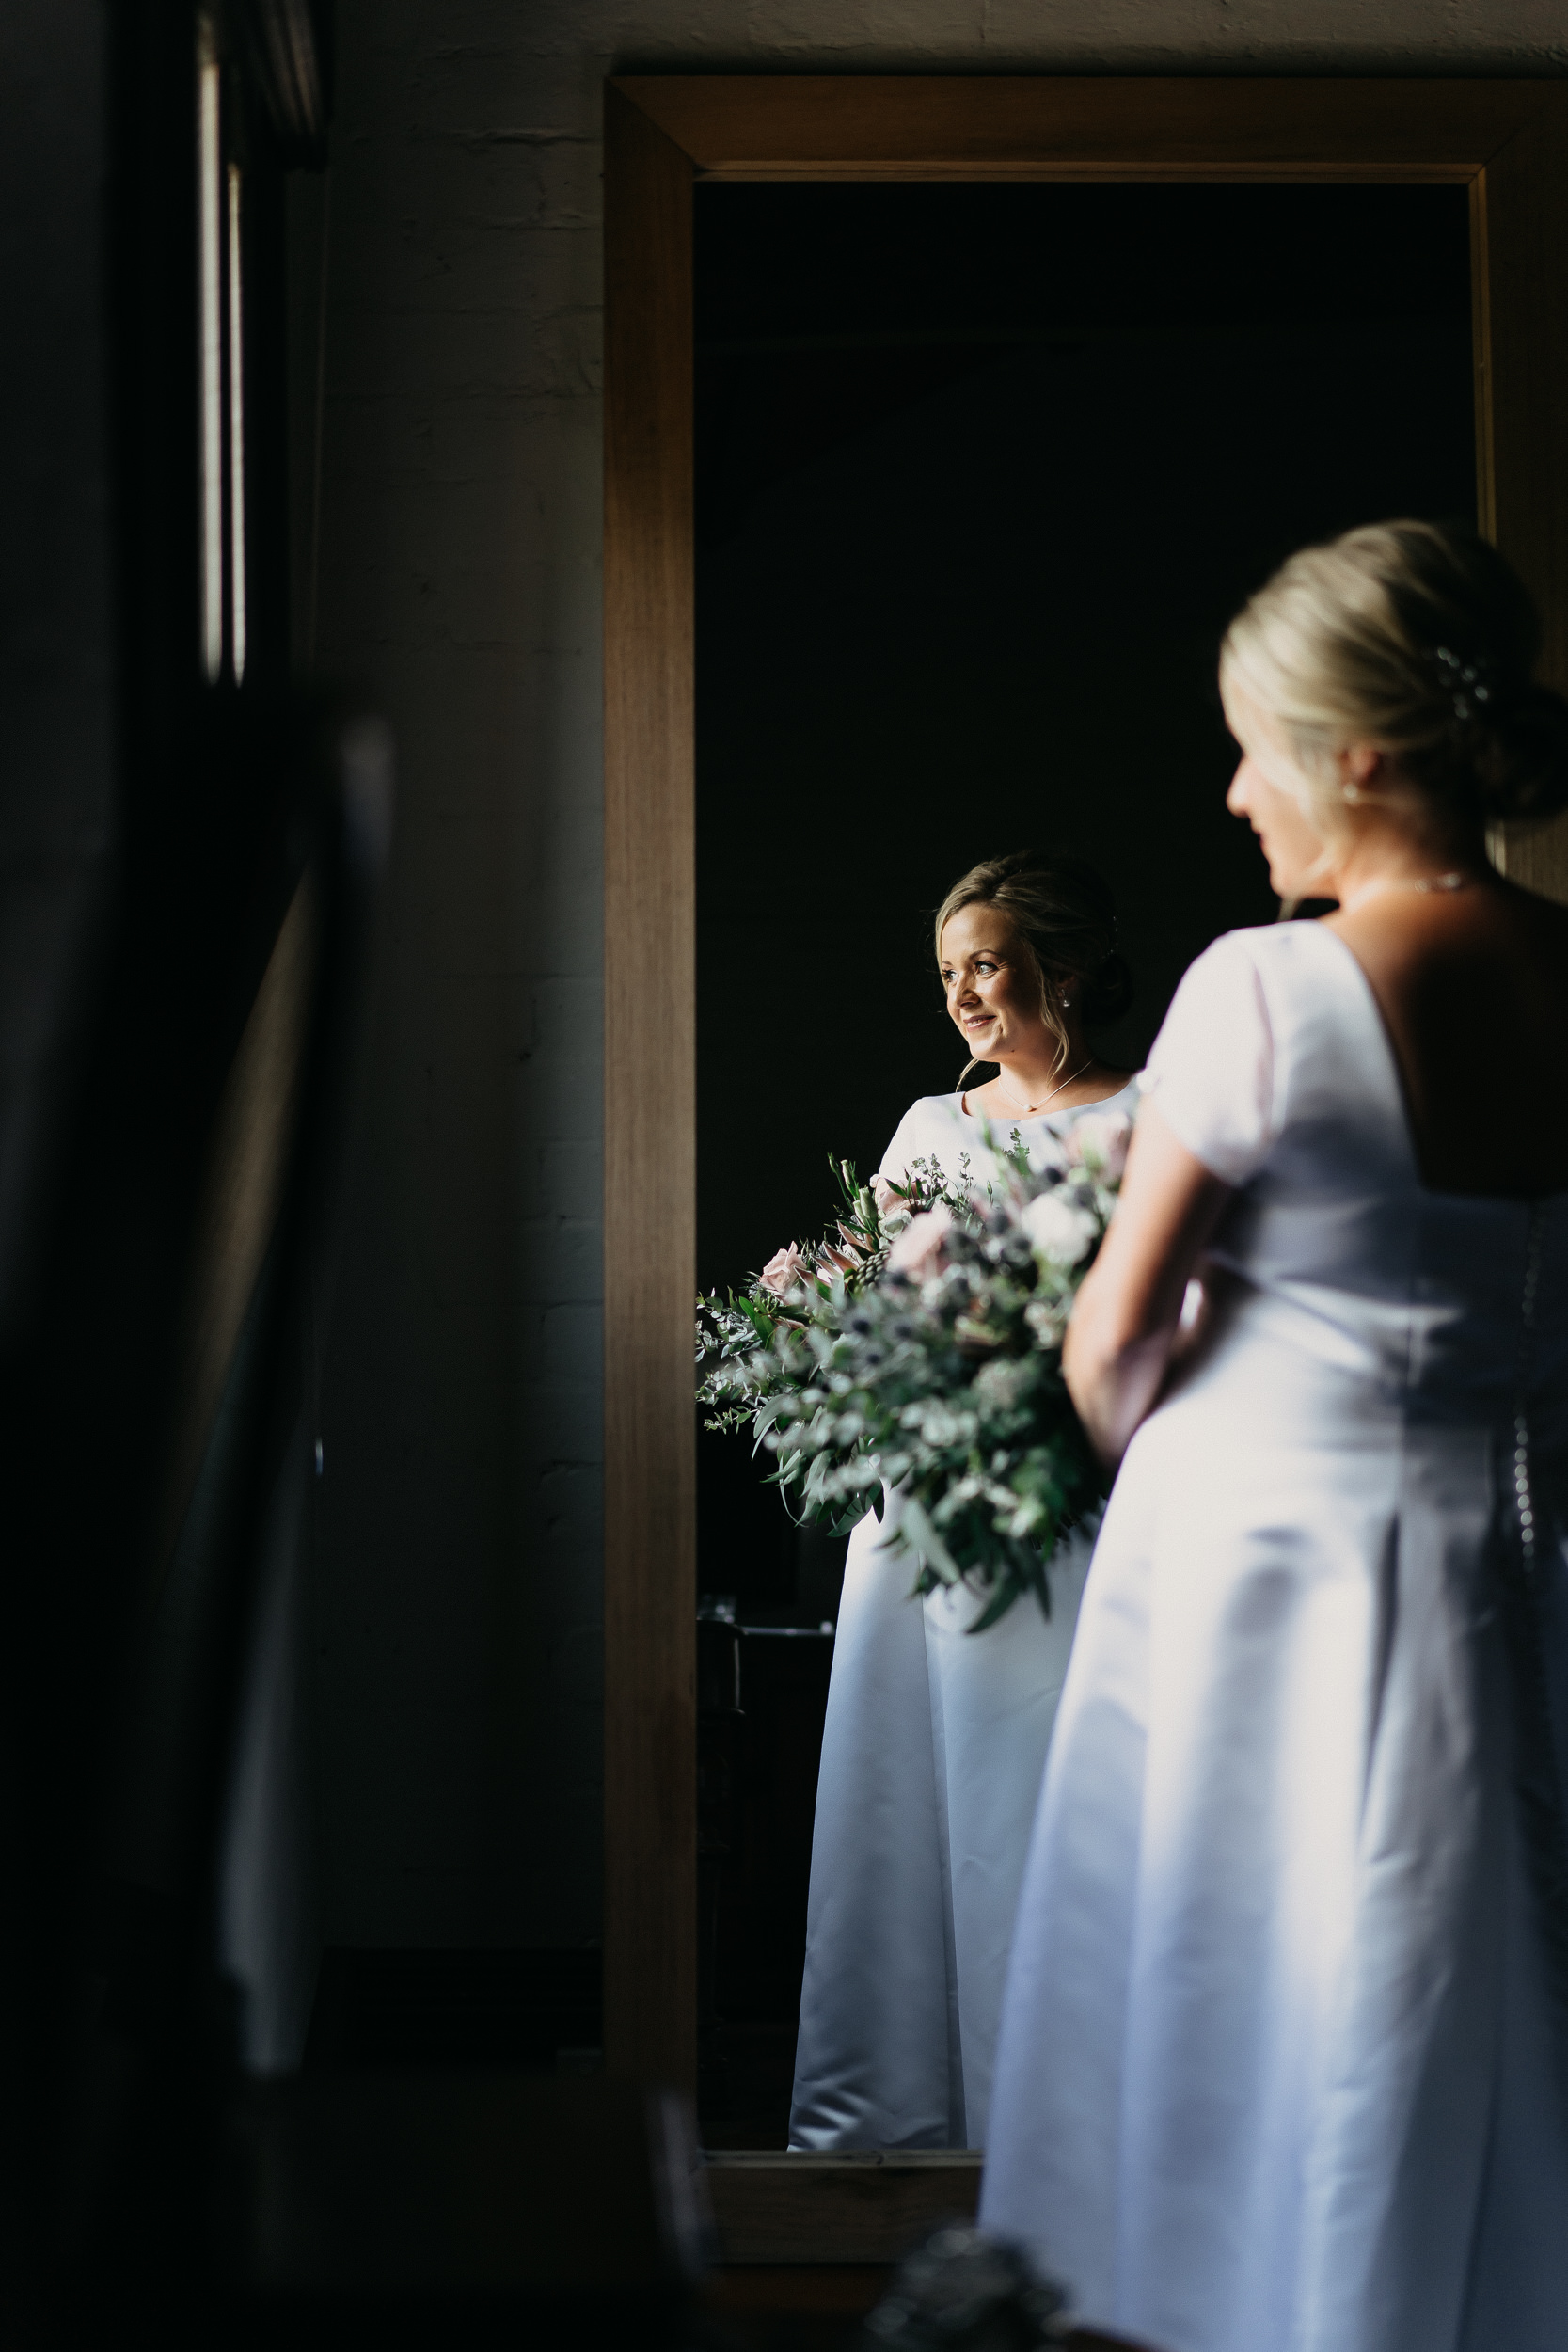 Melbourne-Wedding-Photographer-1001.jpg